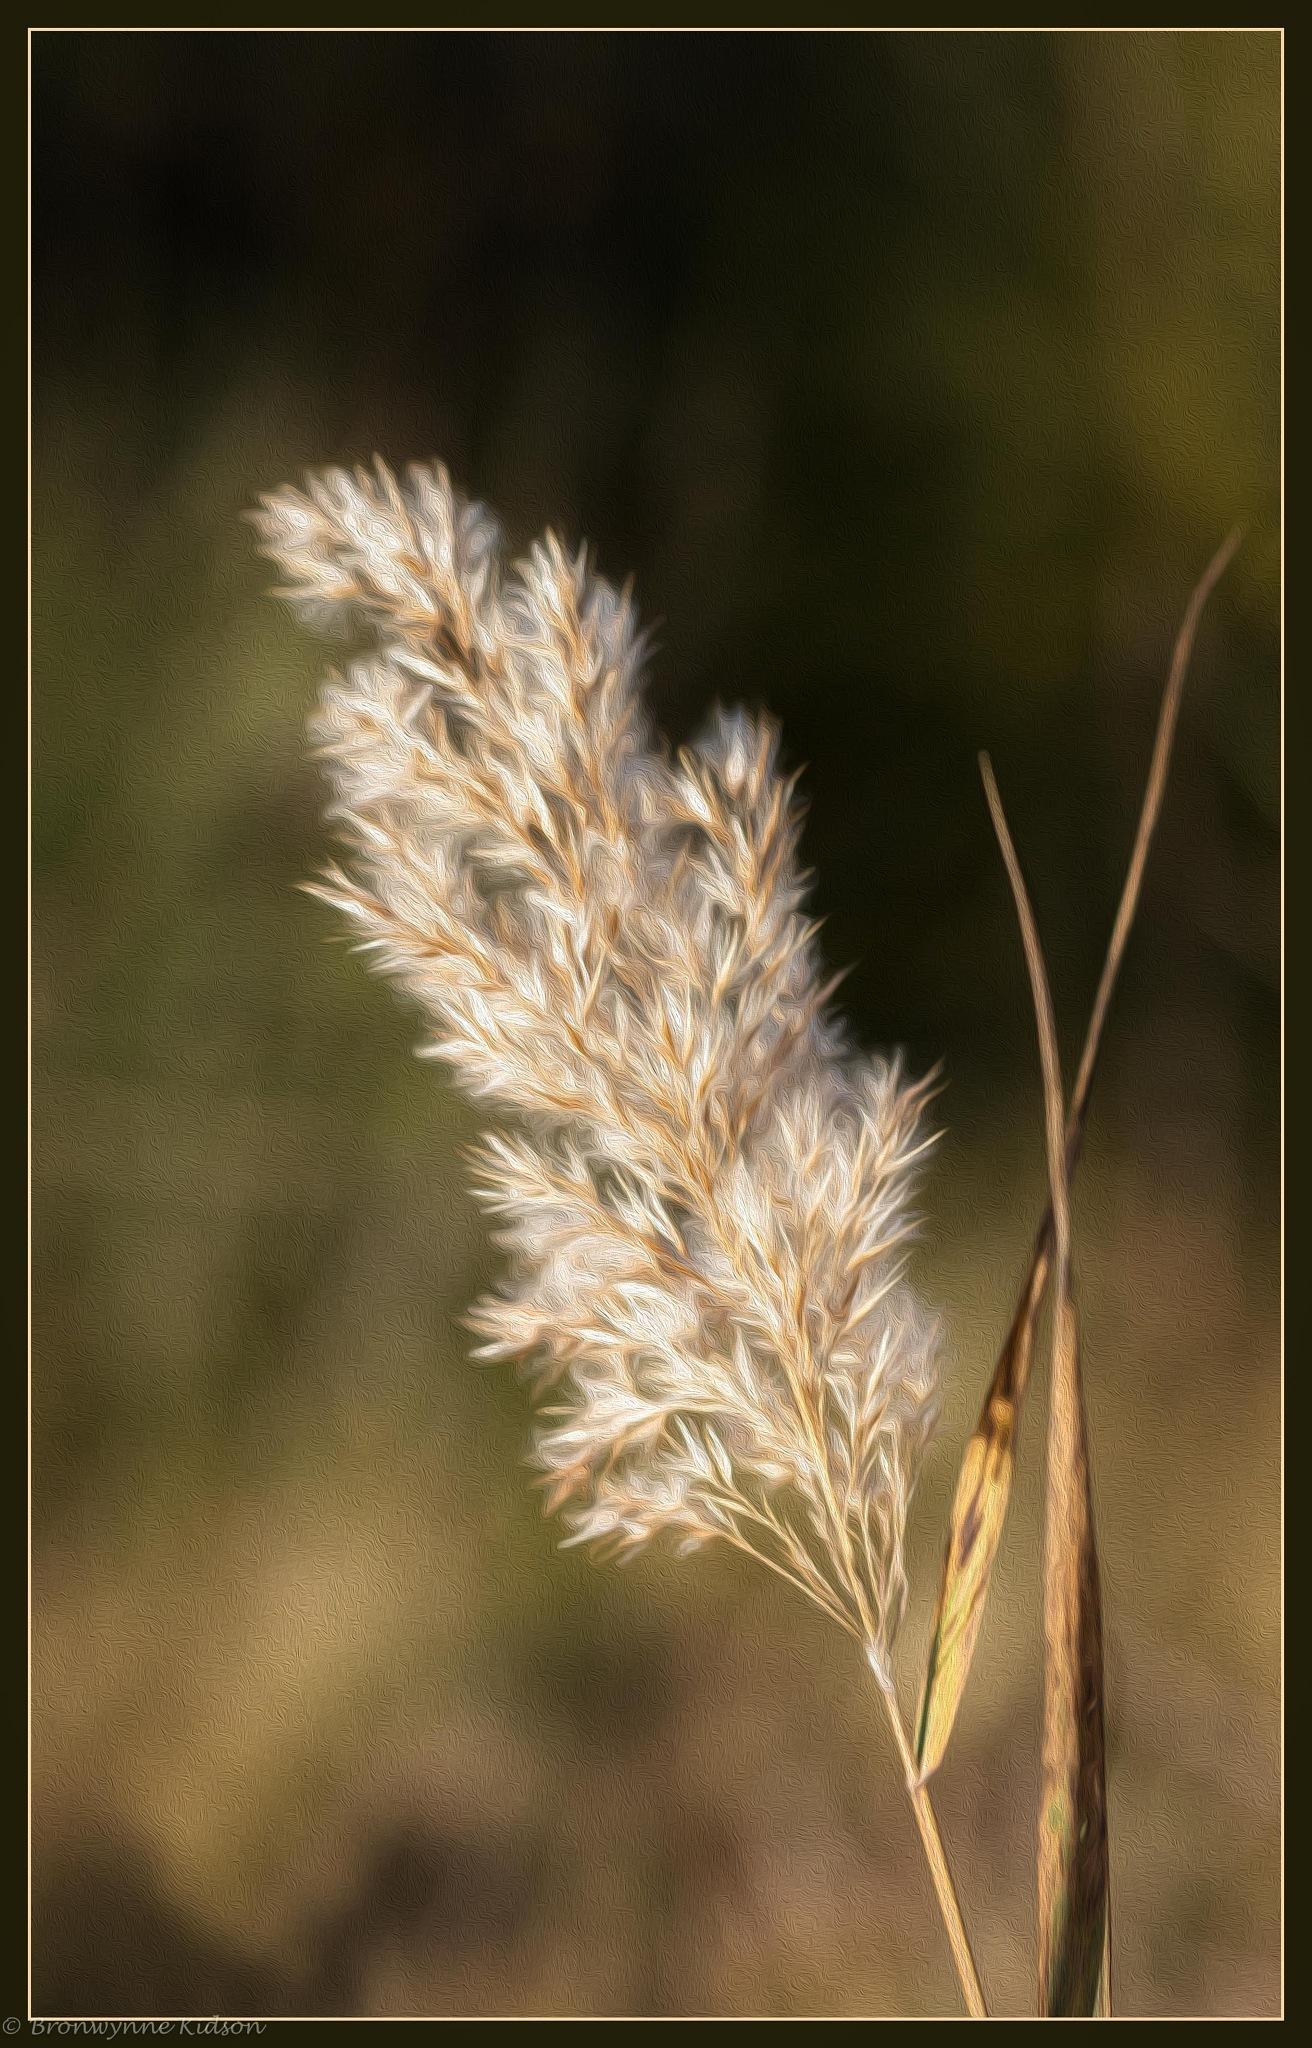 Reed by Bronwynne Kidson